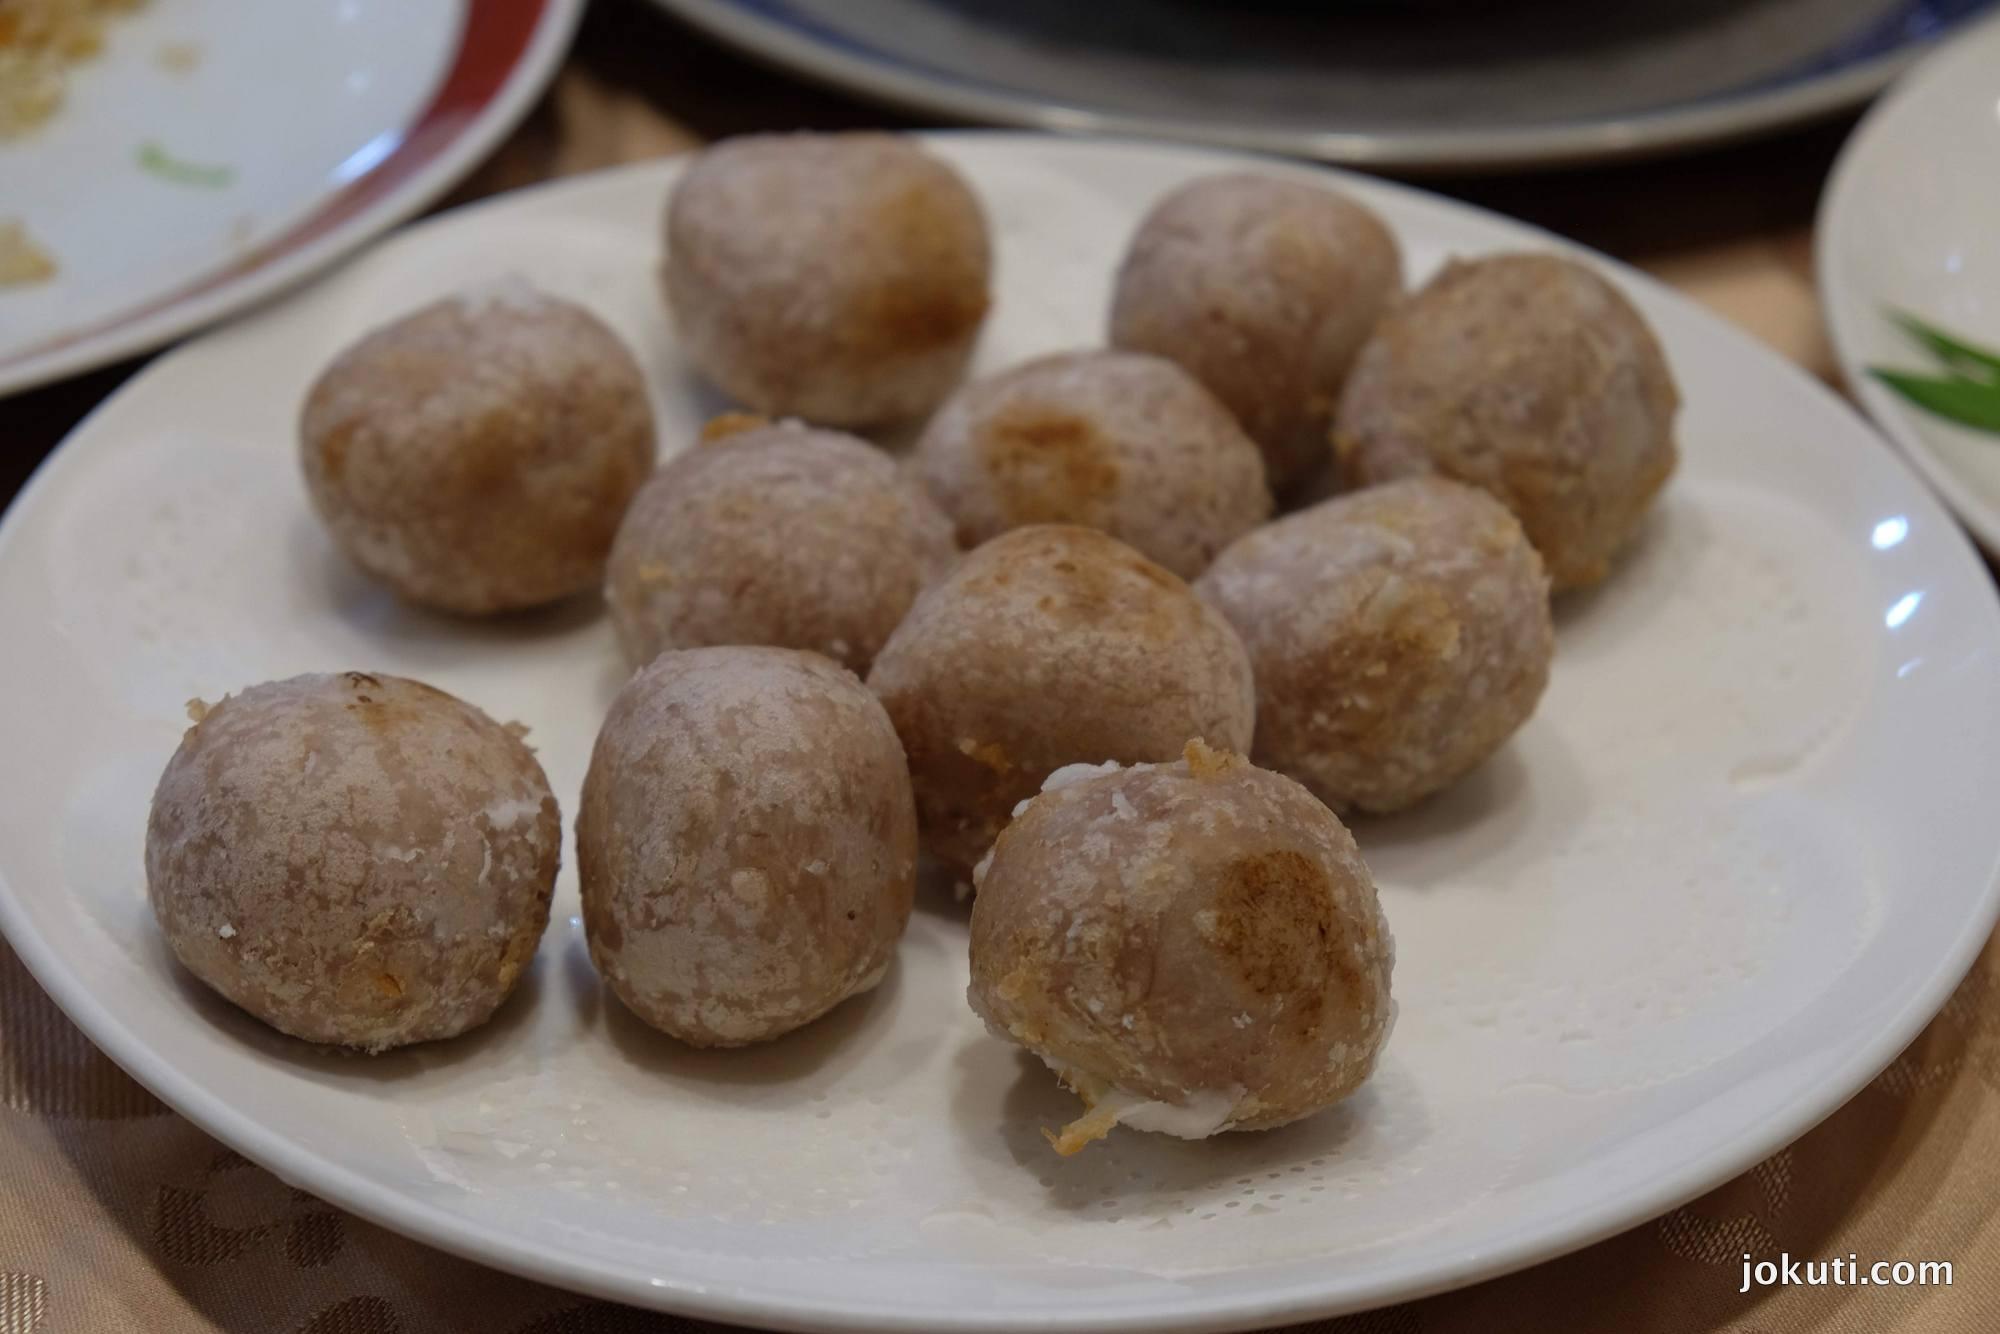 dscf2994_taipei_ming_fu_seafood_michelin_taiwan_vilagevo_jokuti.jpg